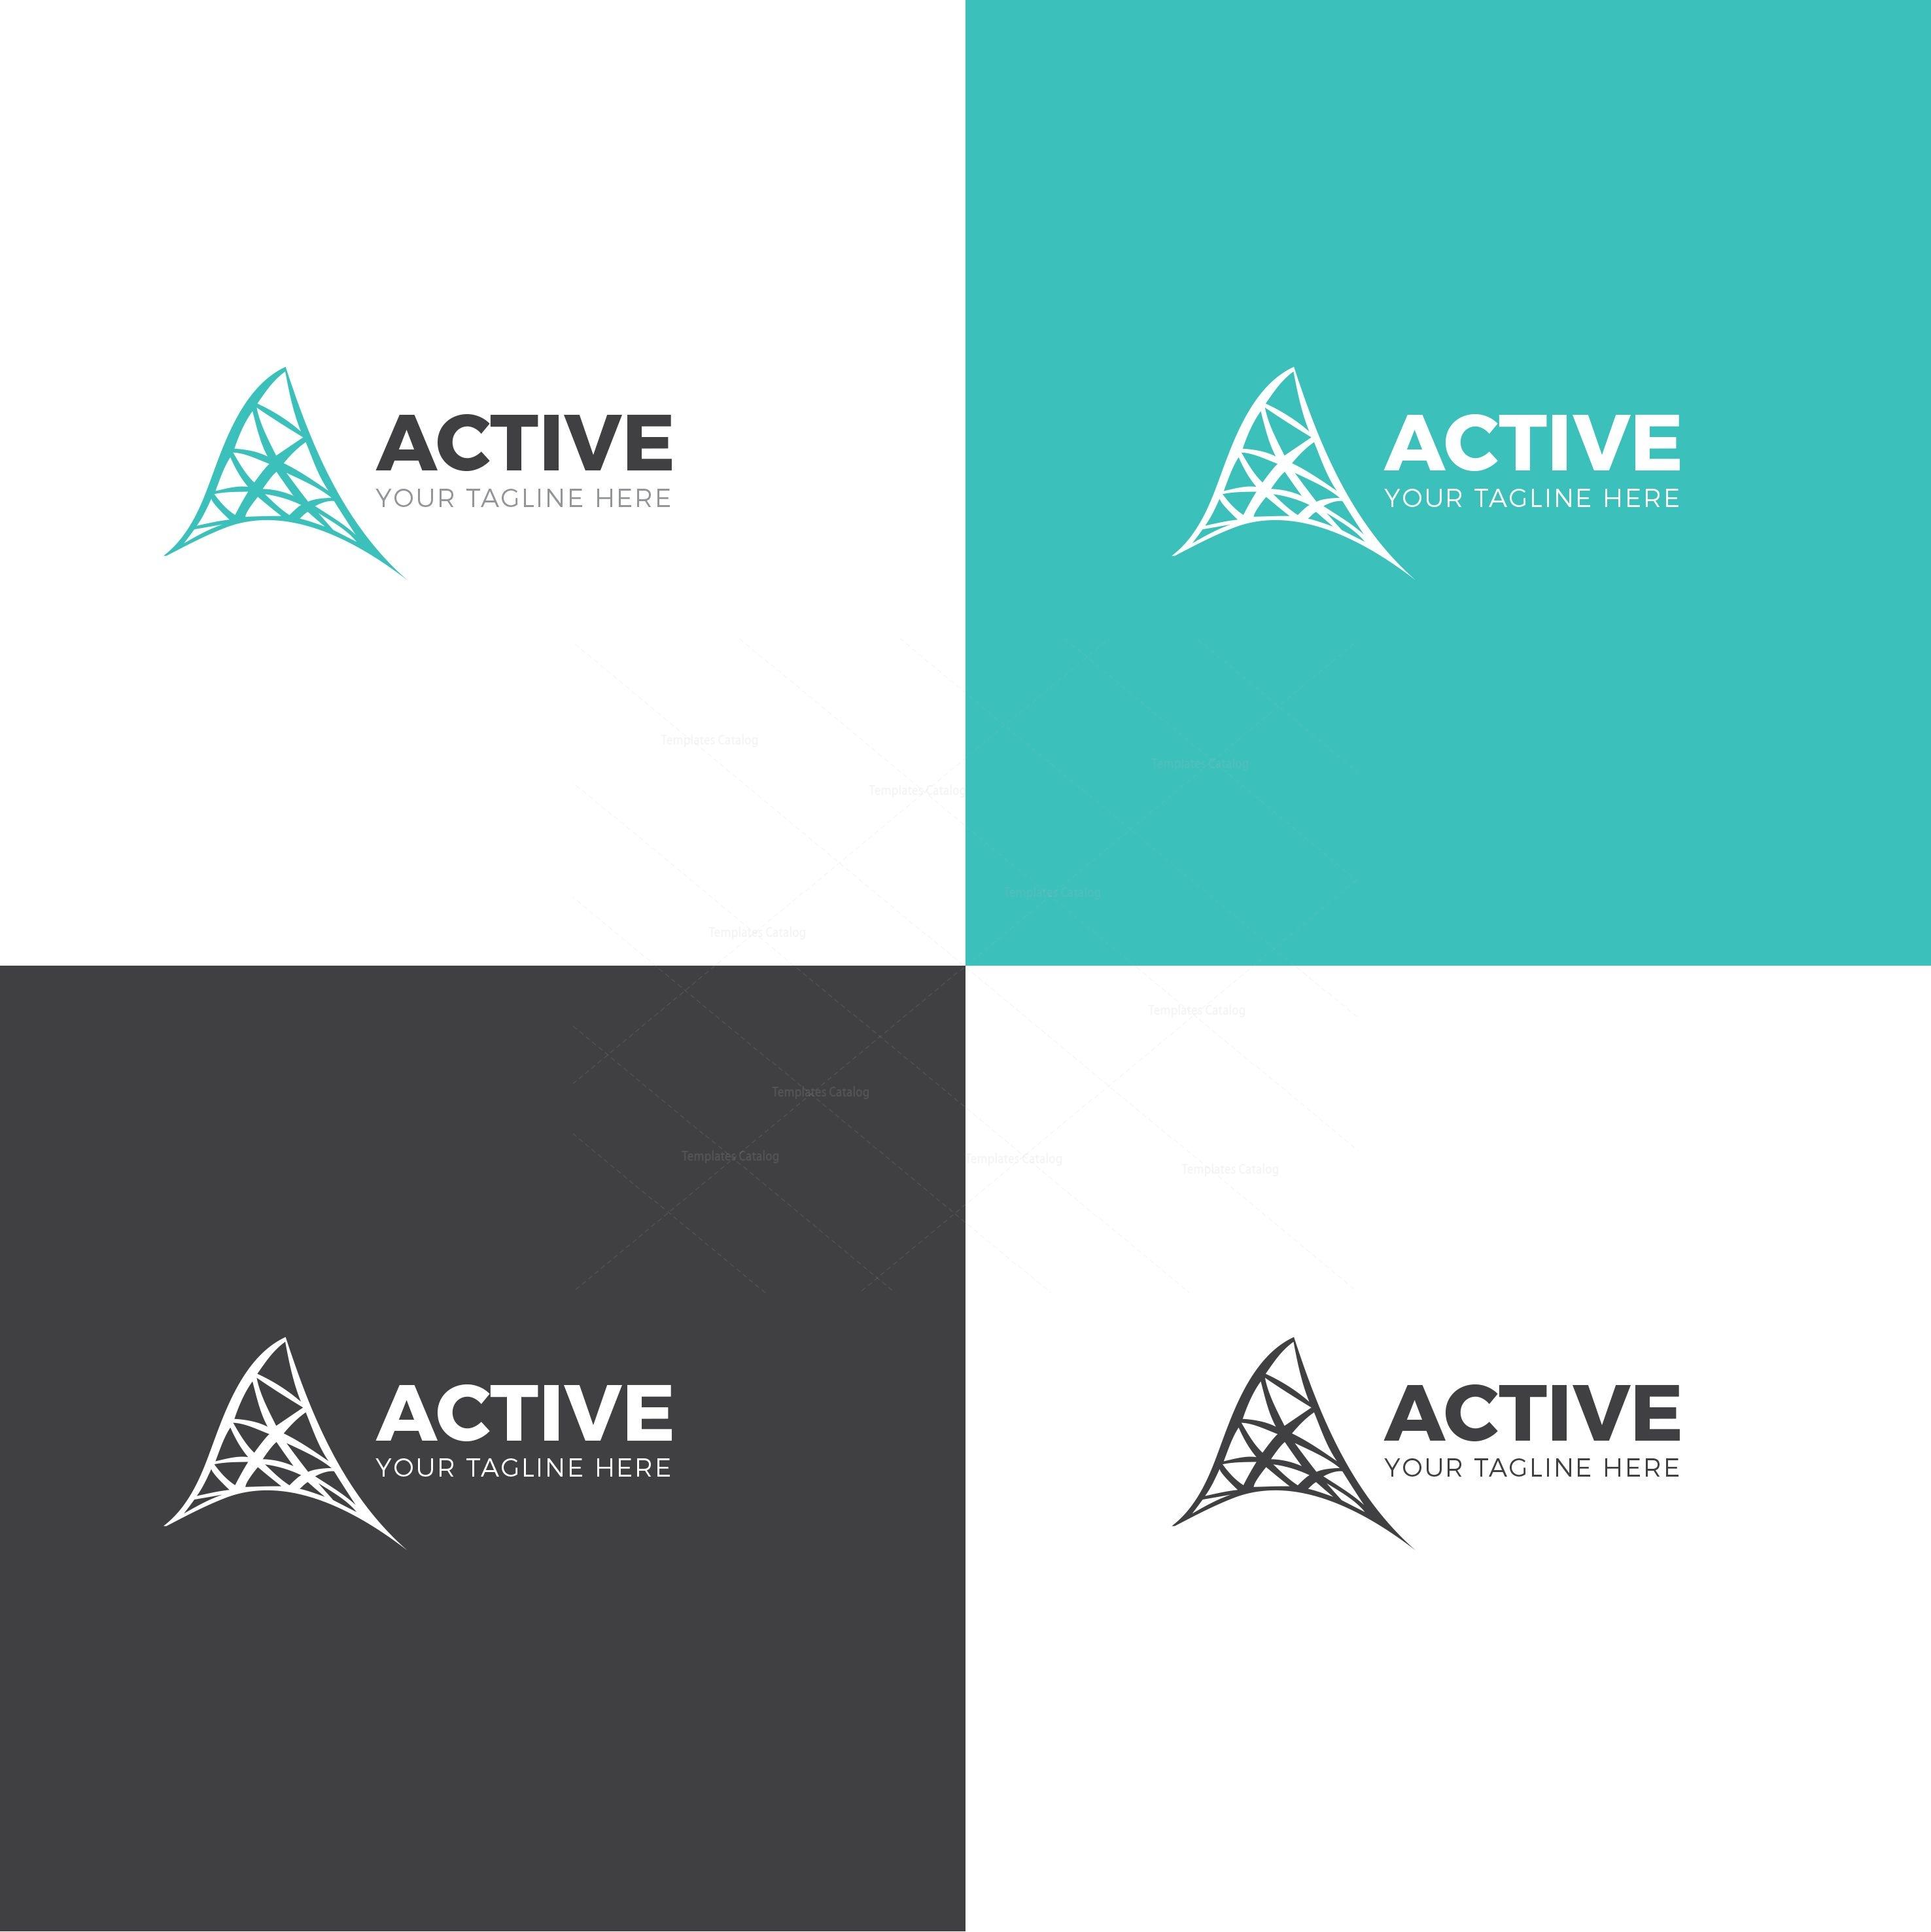 Active Corporate Logo Design Template 001711 - Template ... - photo#18